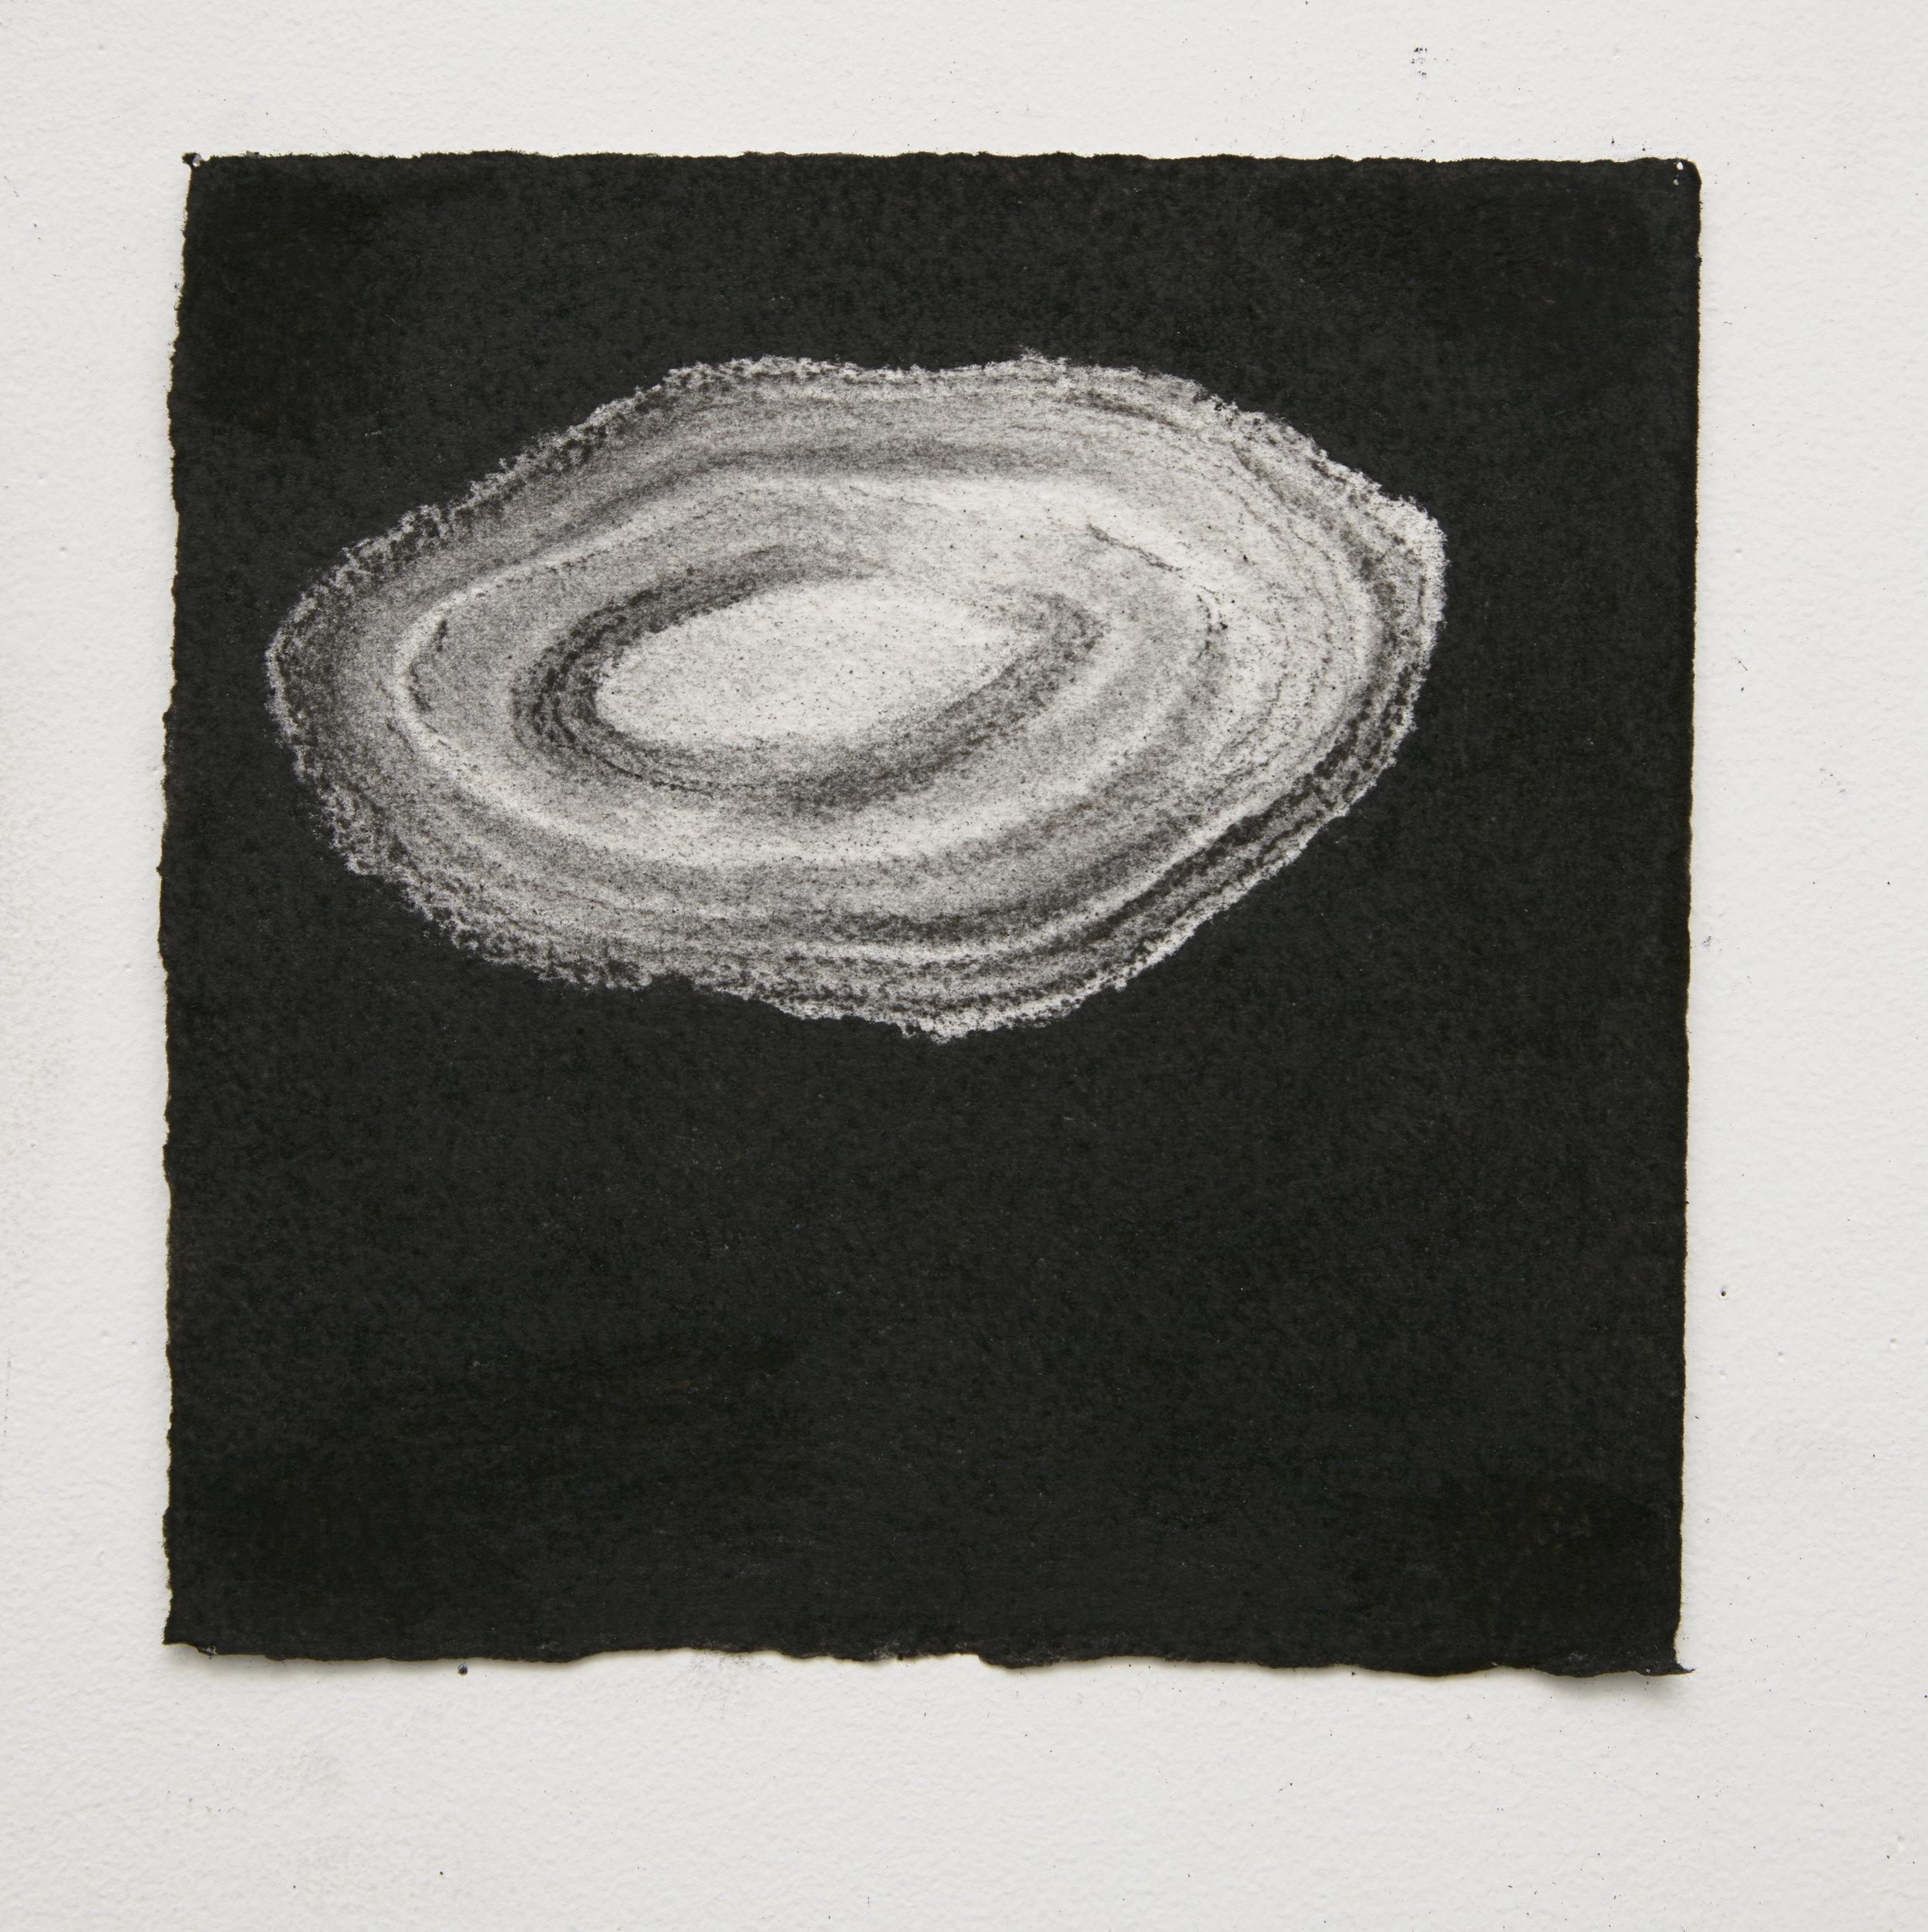 Gemstone #3, 2015, 17.5x17.5cm, charcoal on paper